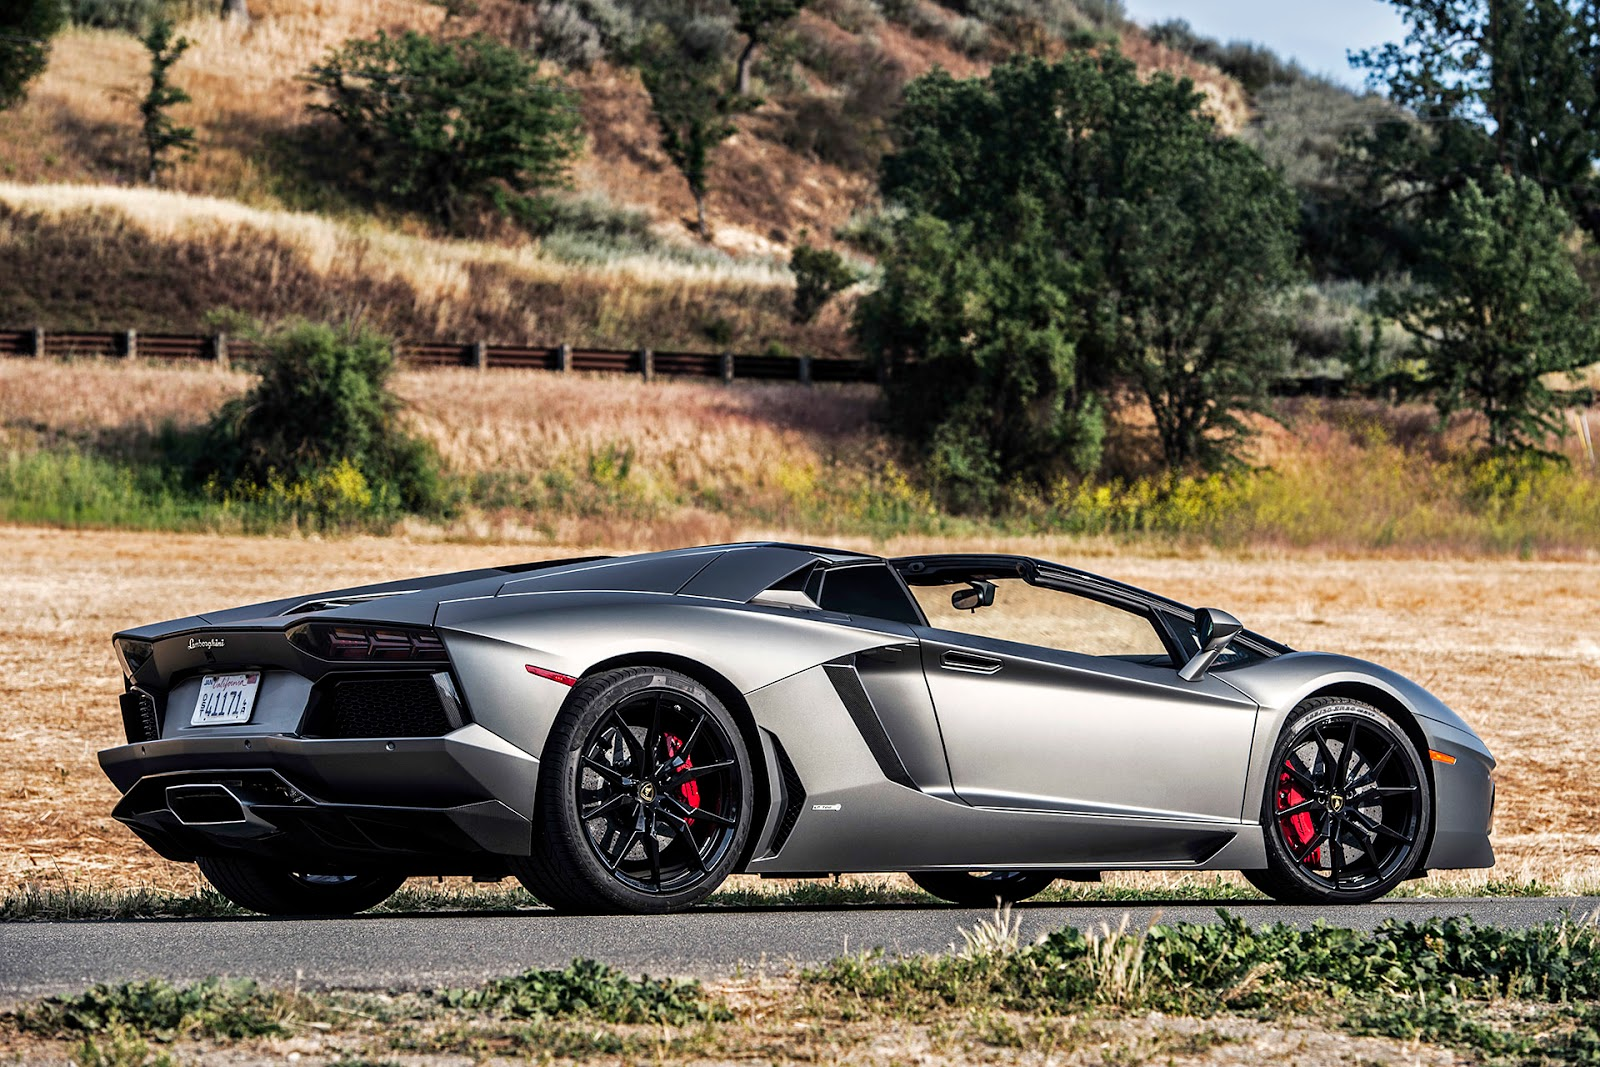 169 Automotiveblogz Lamborghini Aventador Lp 700 4 Roadster